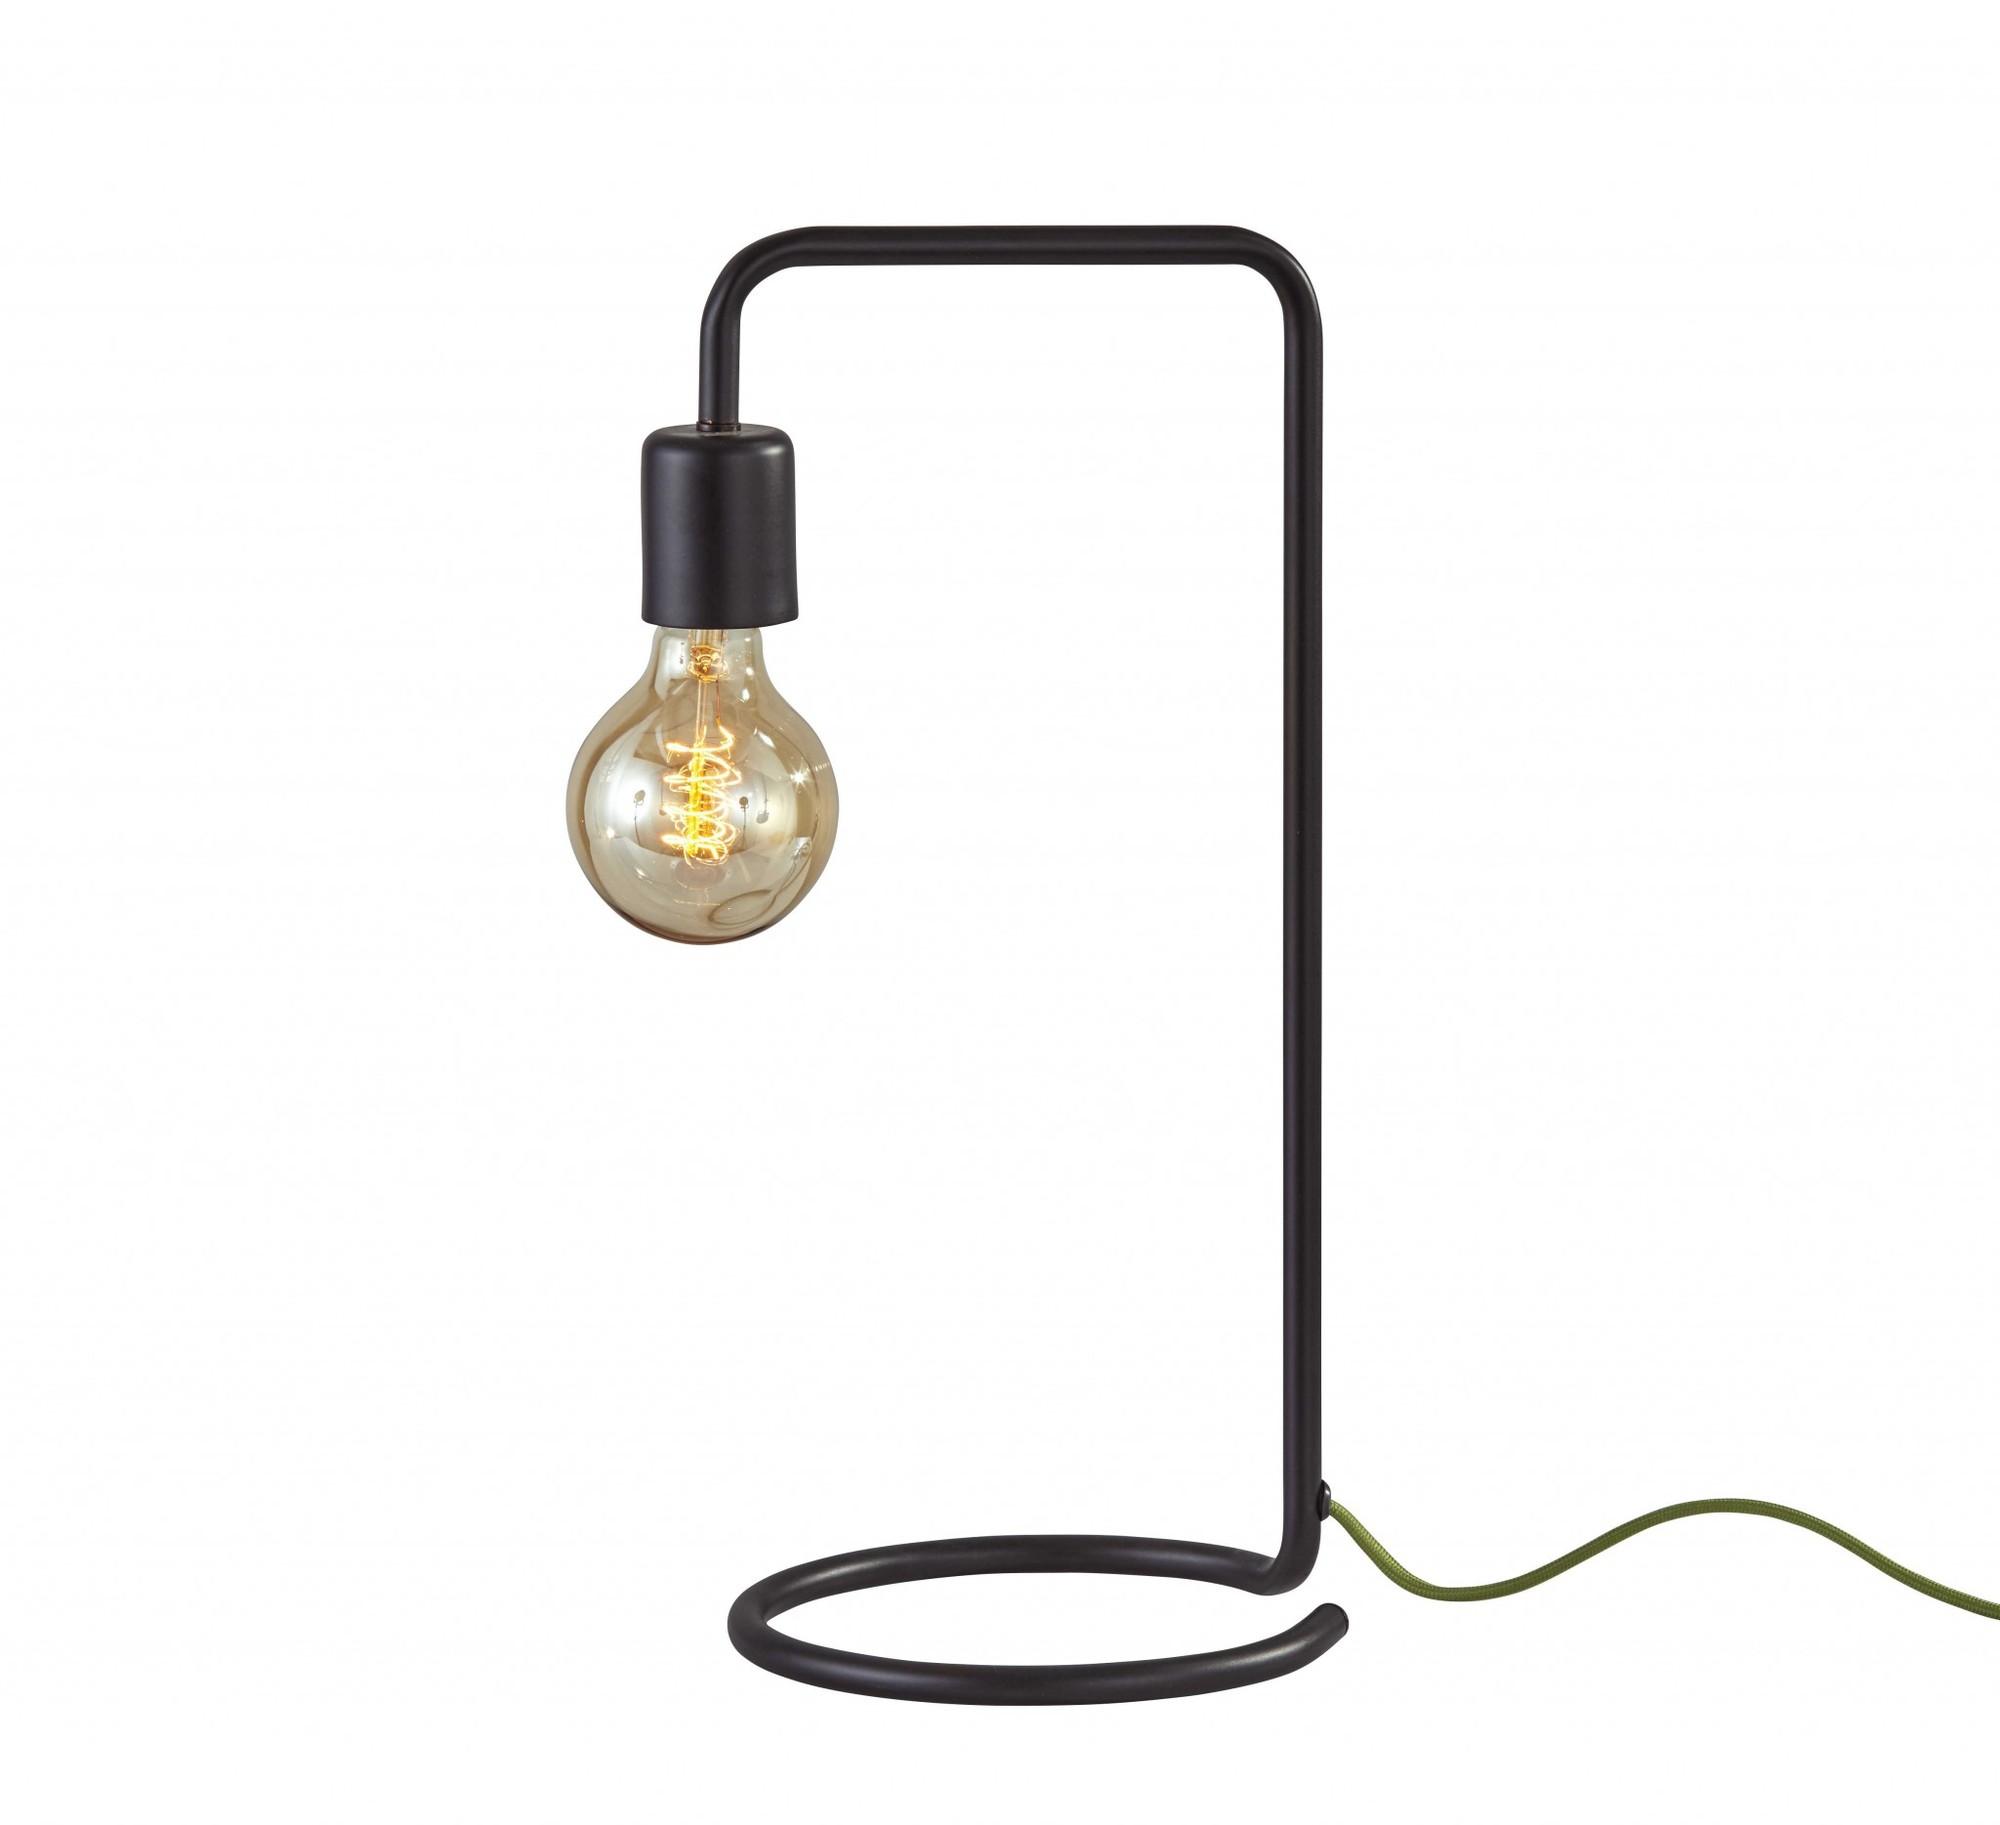 "7.25"" X 9"" X 16.5"" Brushed Steel Metal Desk Lamp"